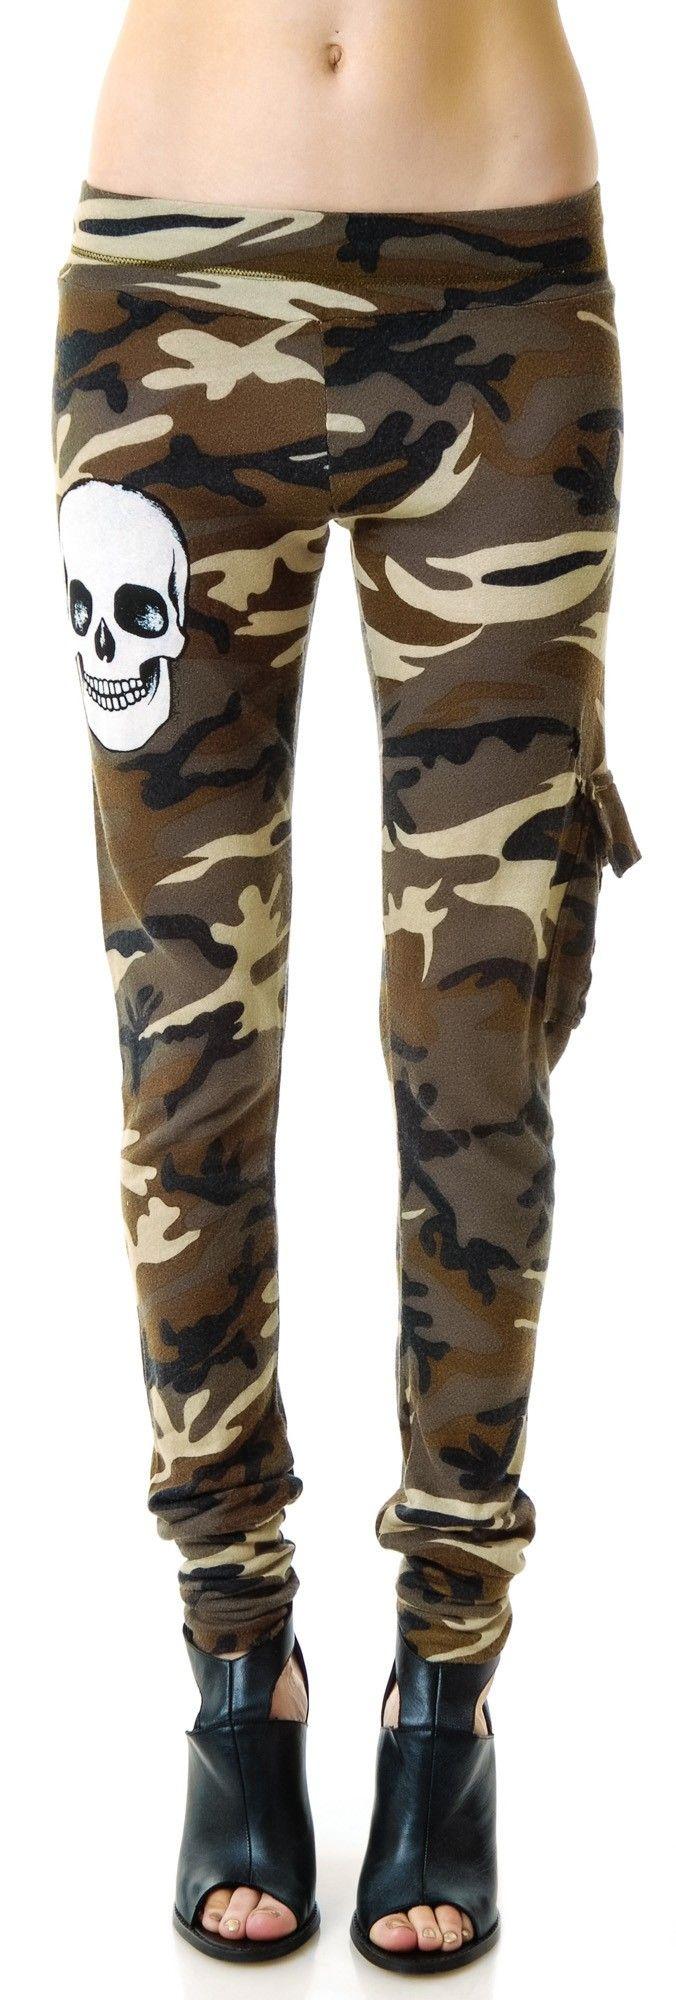 Izzy Camo Cargo Pants #boydollsincamo